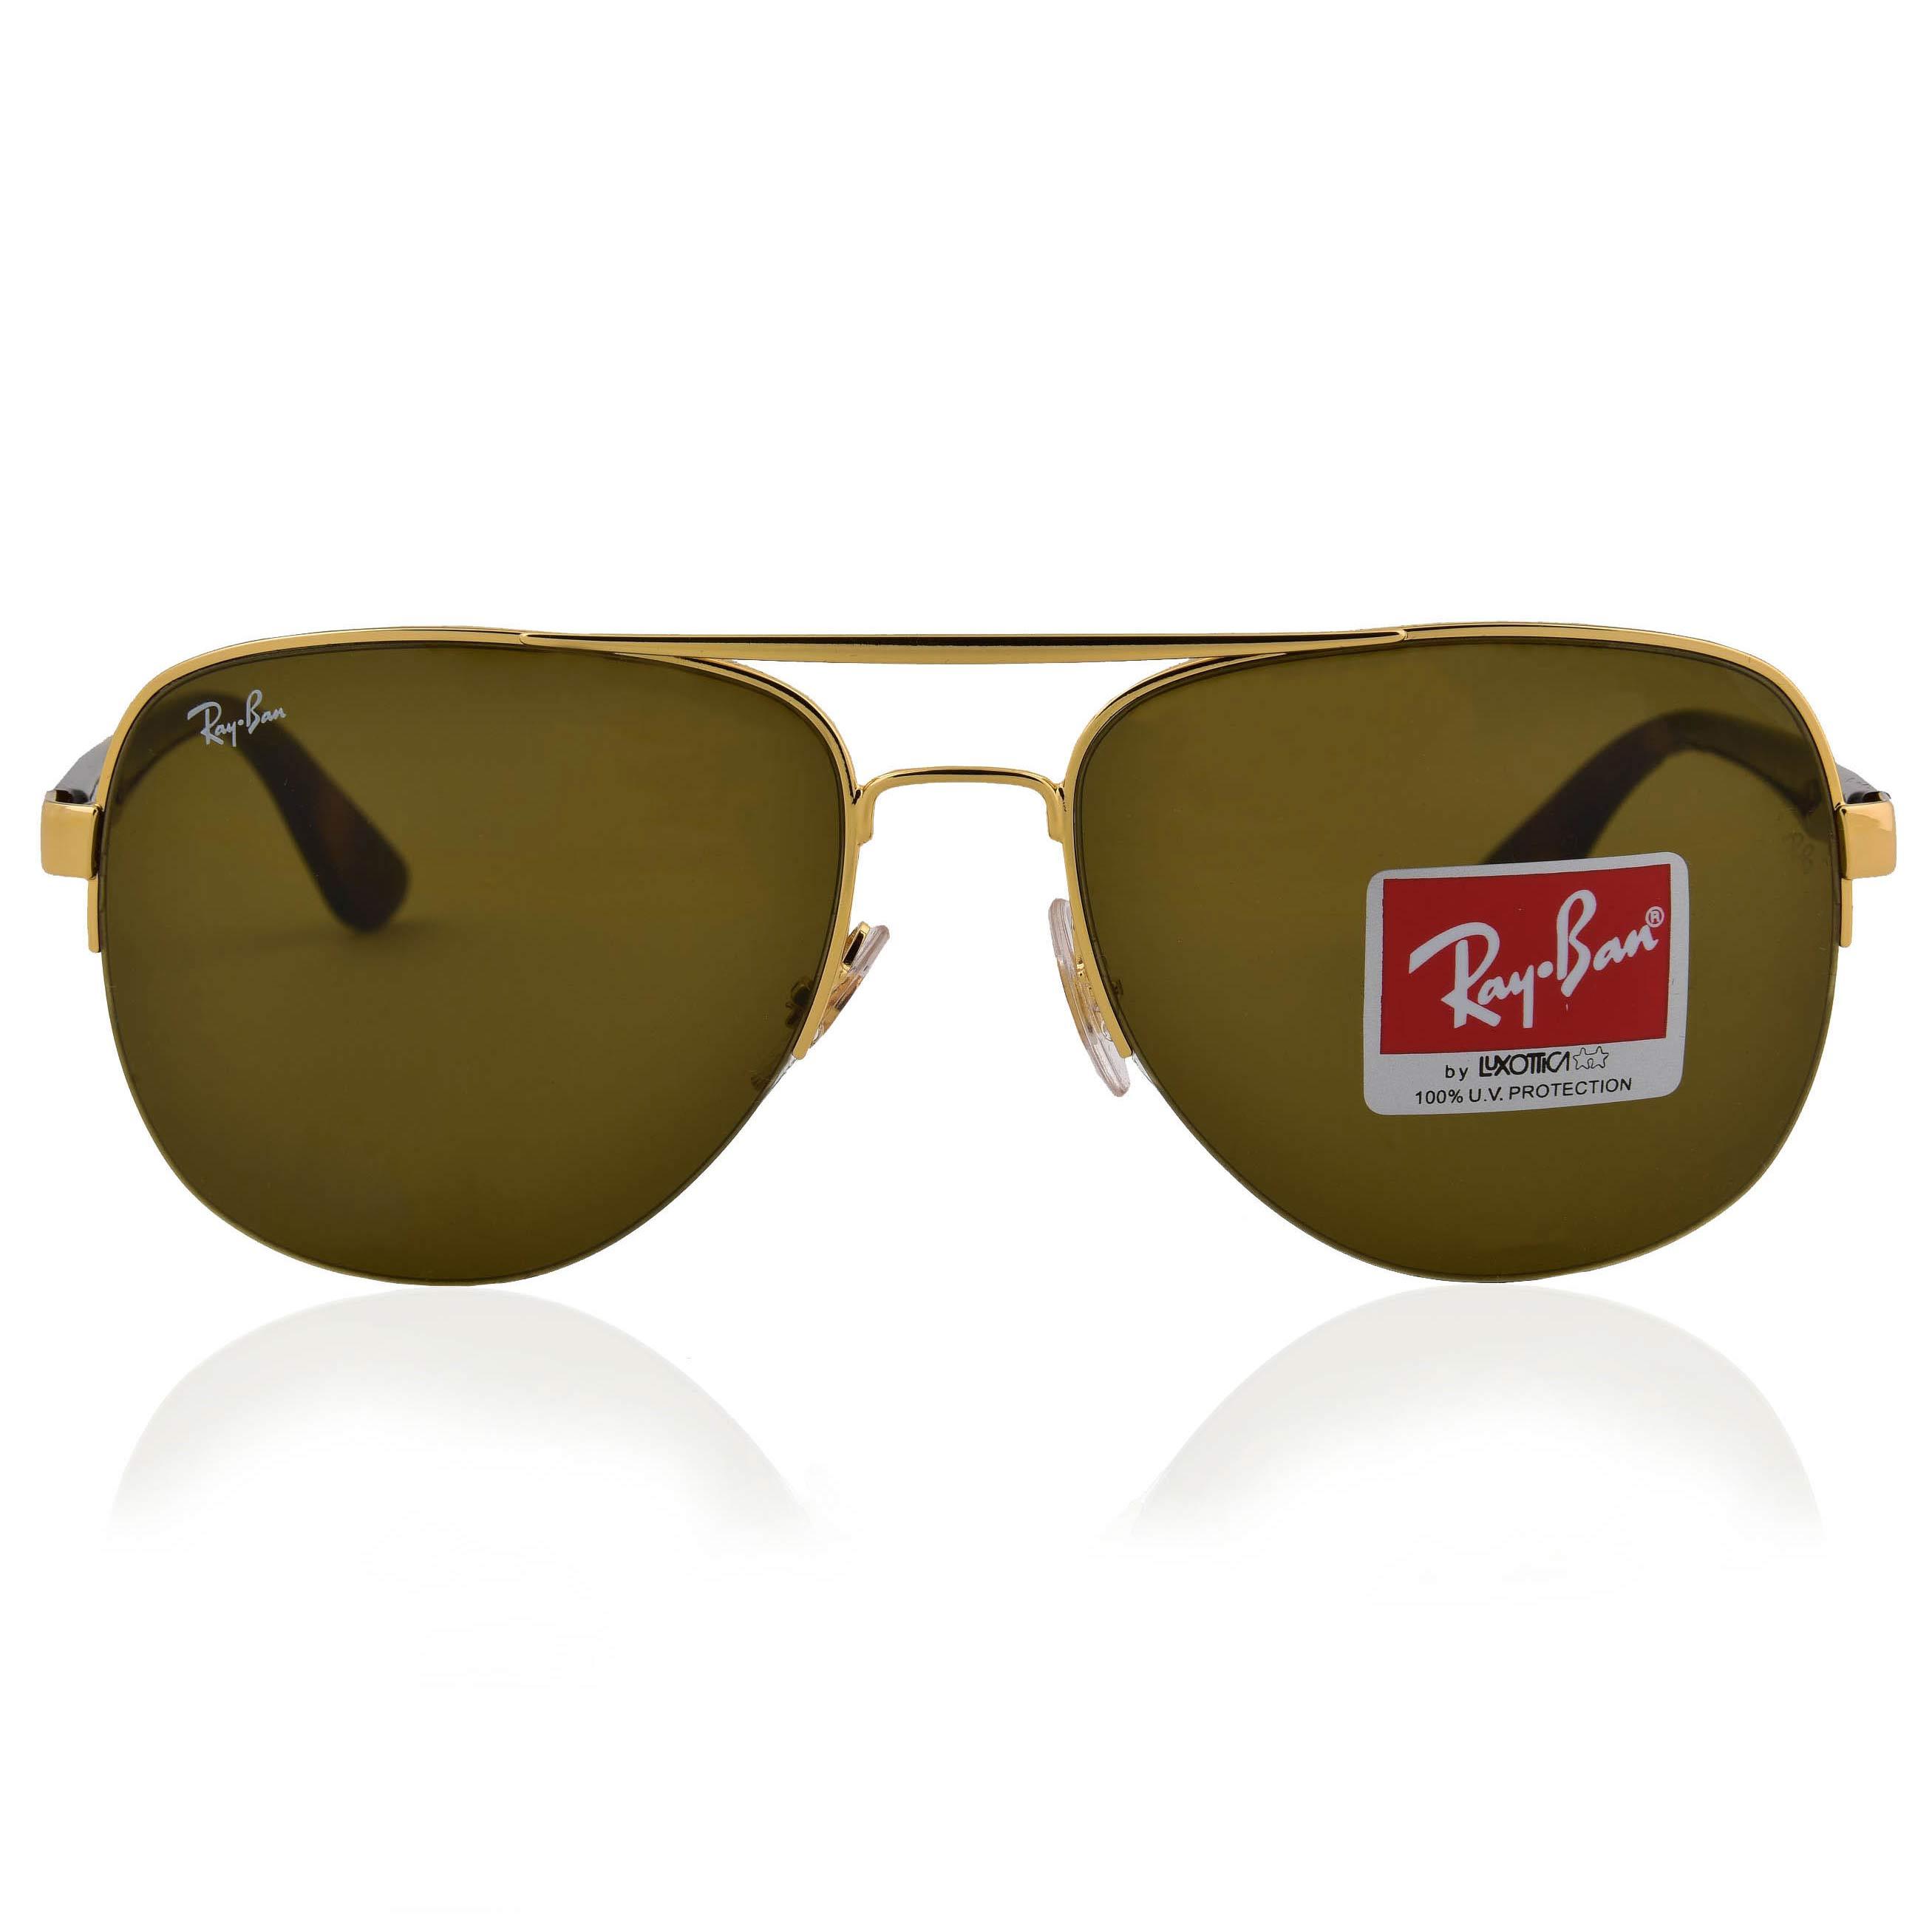 9f5c145e8 راي-بان نظارات شمسية RB3552I أفياتور للجنسين، عدسة لون بني، 001/73-58 -  UPC: 8053672655834 | أسواق.كوم